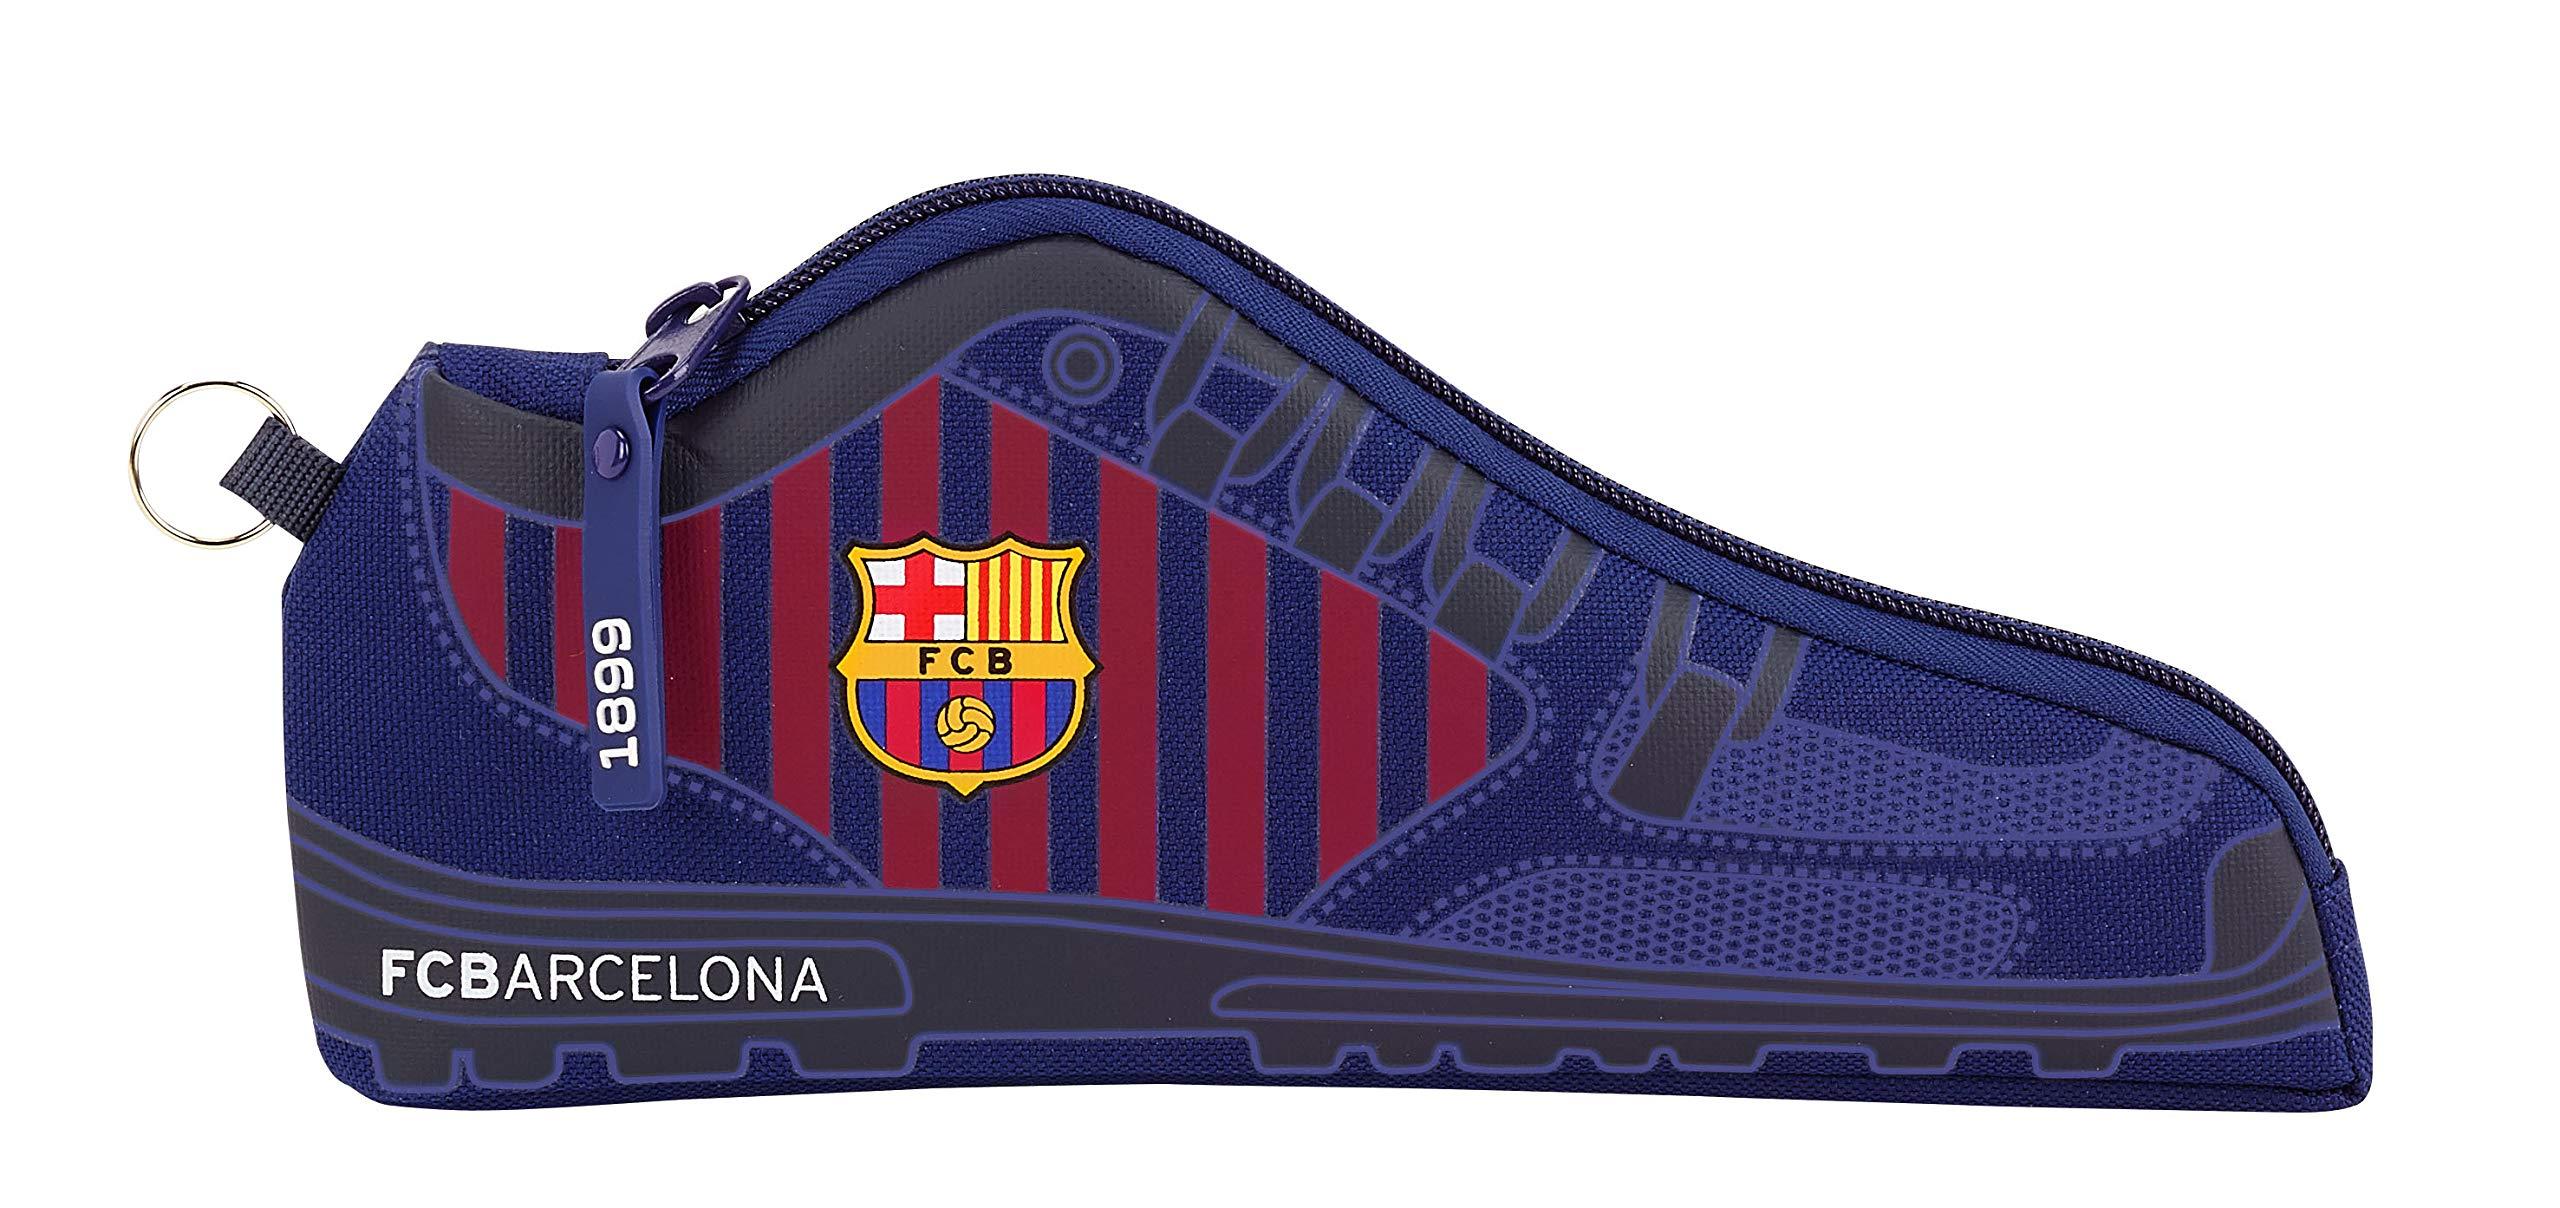 FC Barcelona 811829584 2018 Estuches 24 cm, Azul